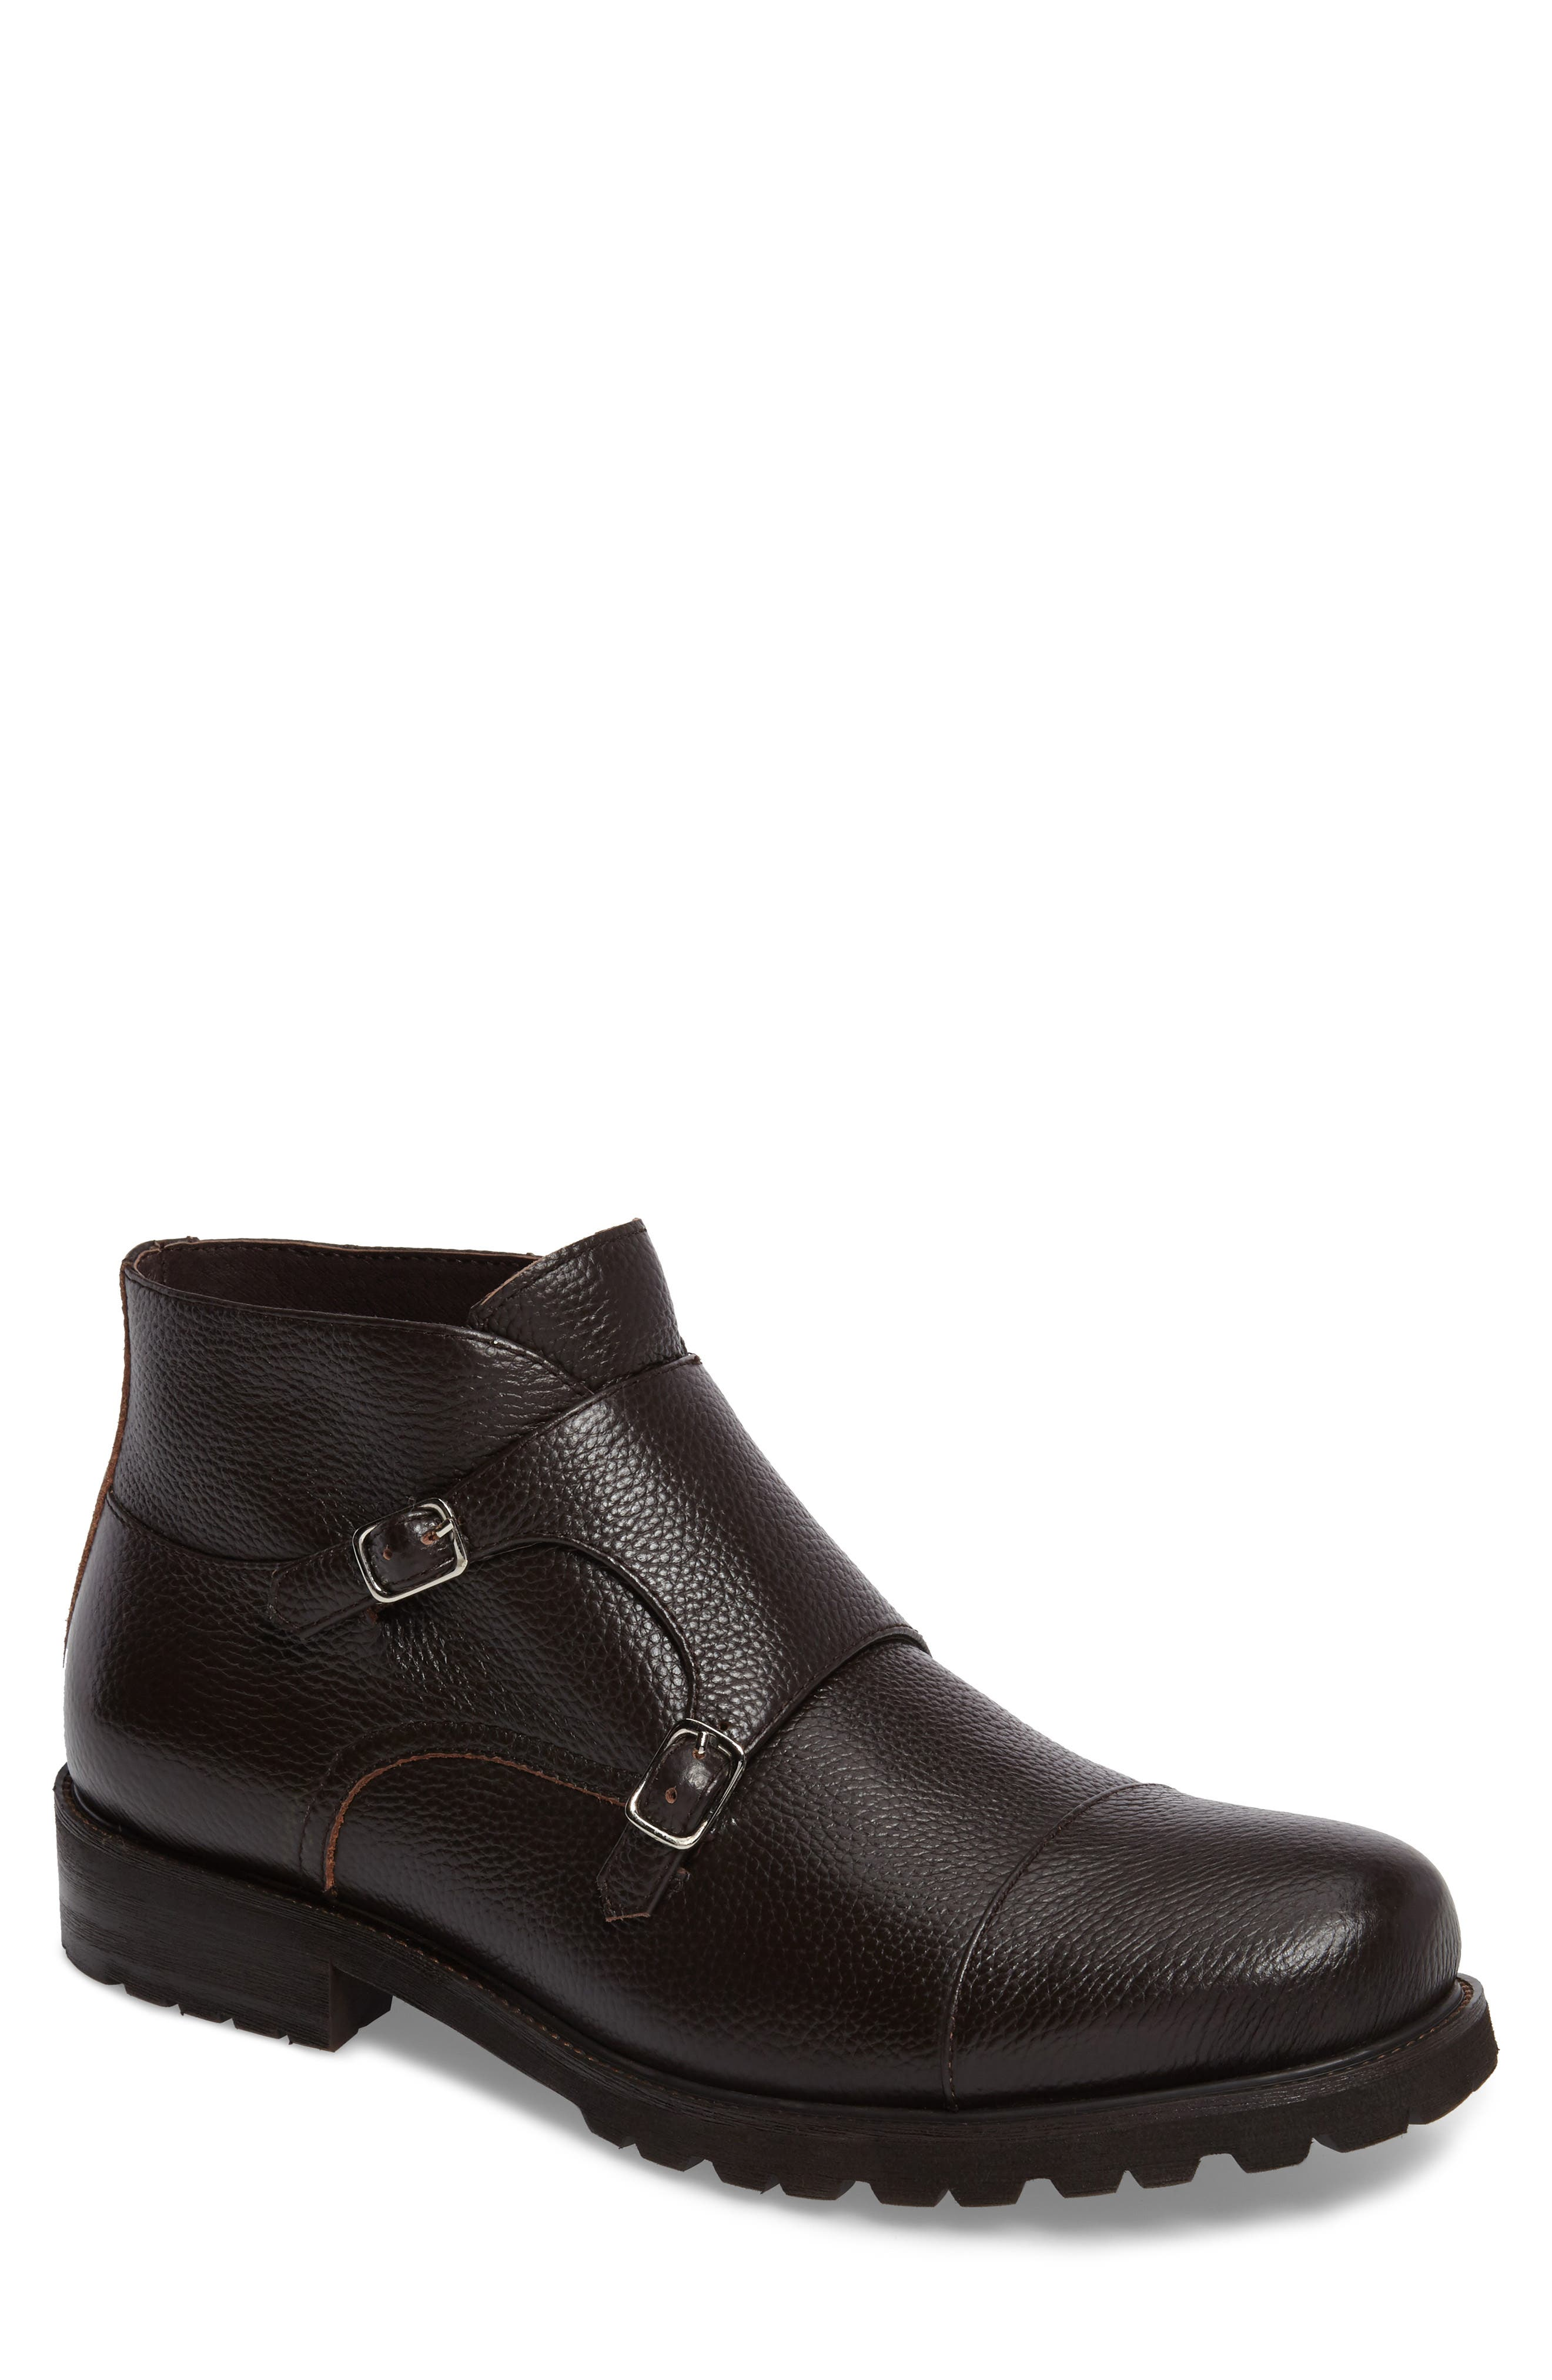 Koller Cap Toe Double Monk Boot,                             Main thumbnail 1, color,                             Black Leather